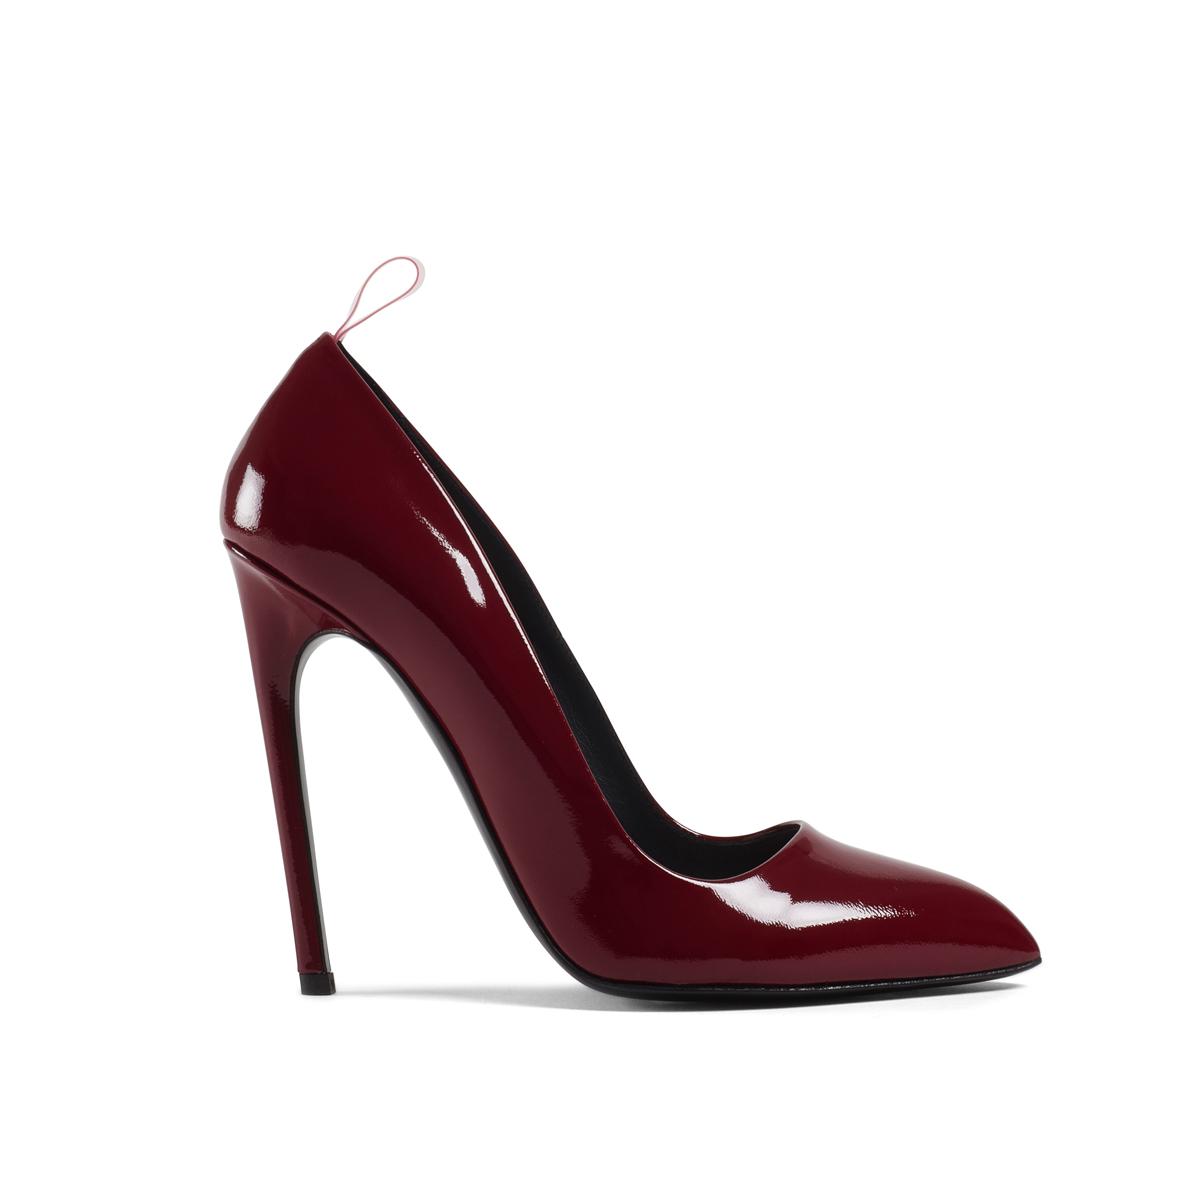 017_alaintondowski_springsummer2017_shoes_3060-110